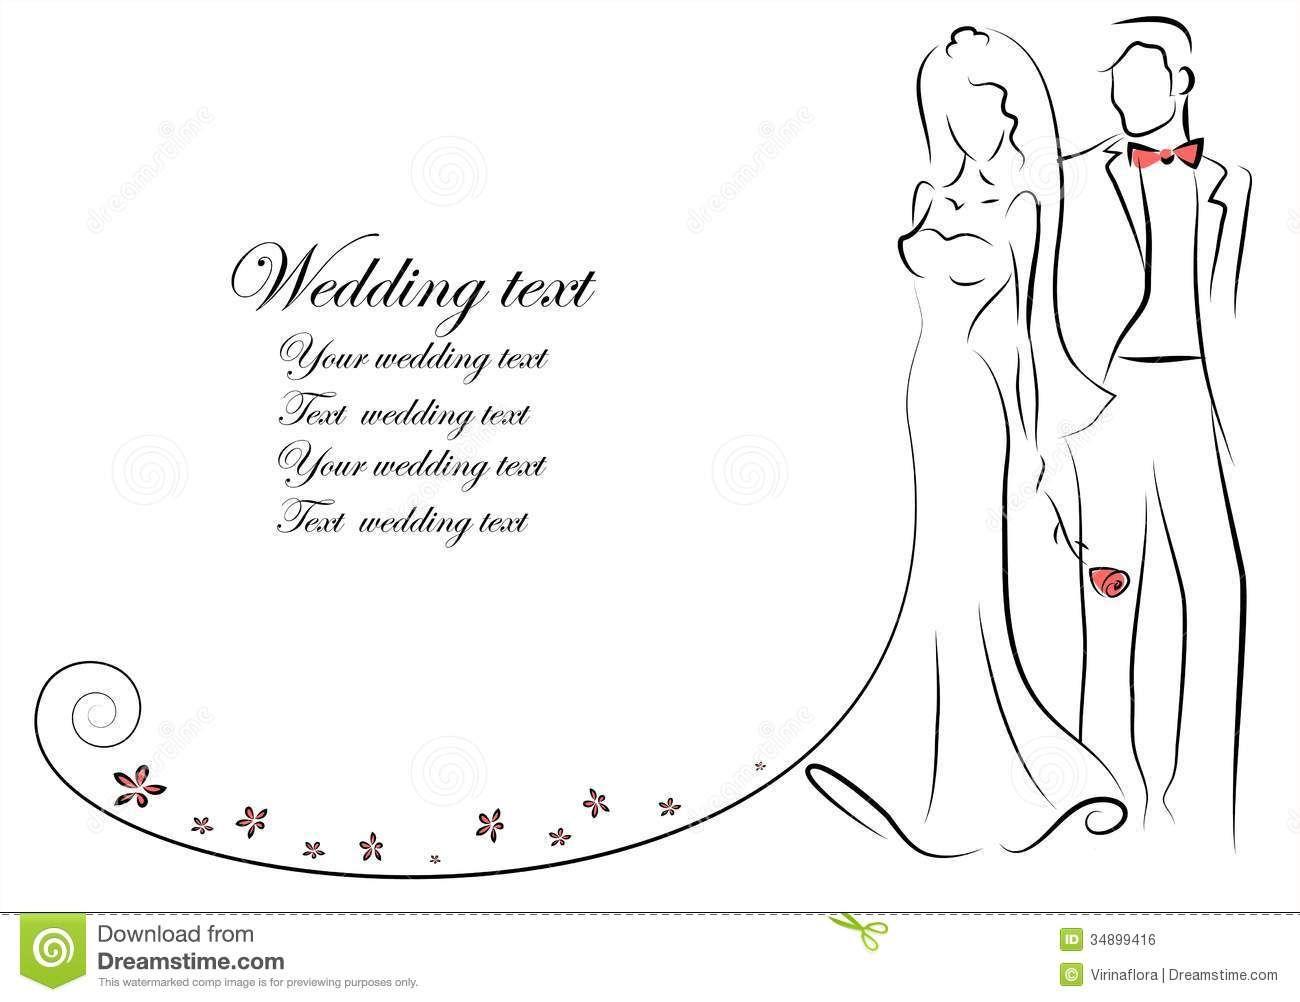 wedding couple silhouette beach - Google Search | Προσκλητήρια ...